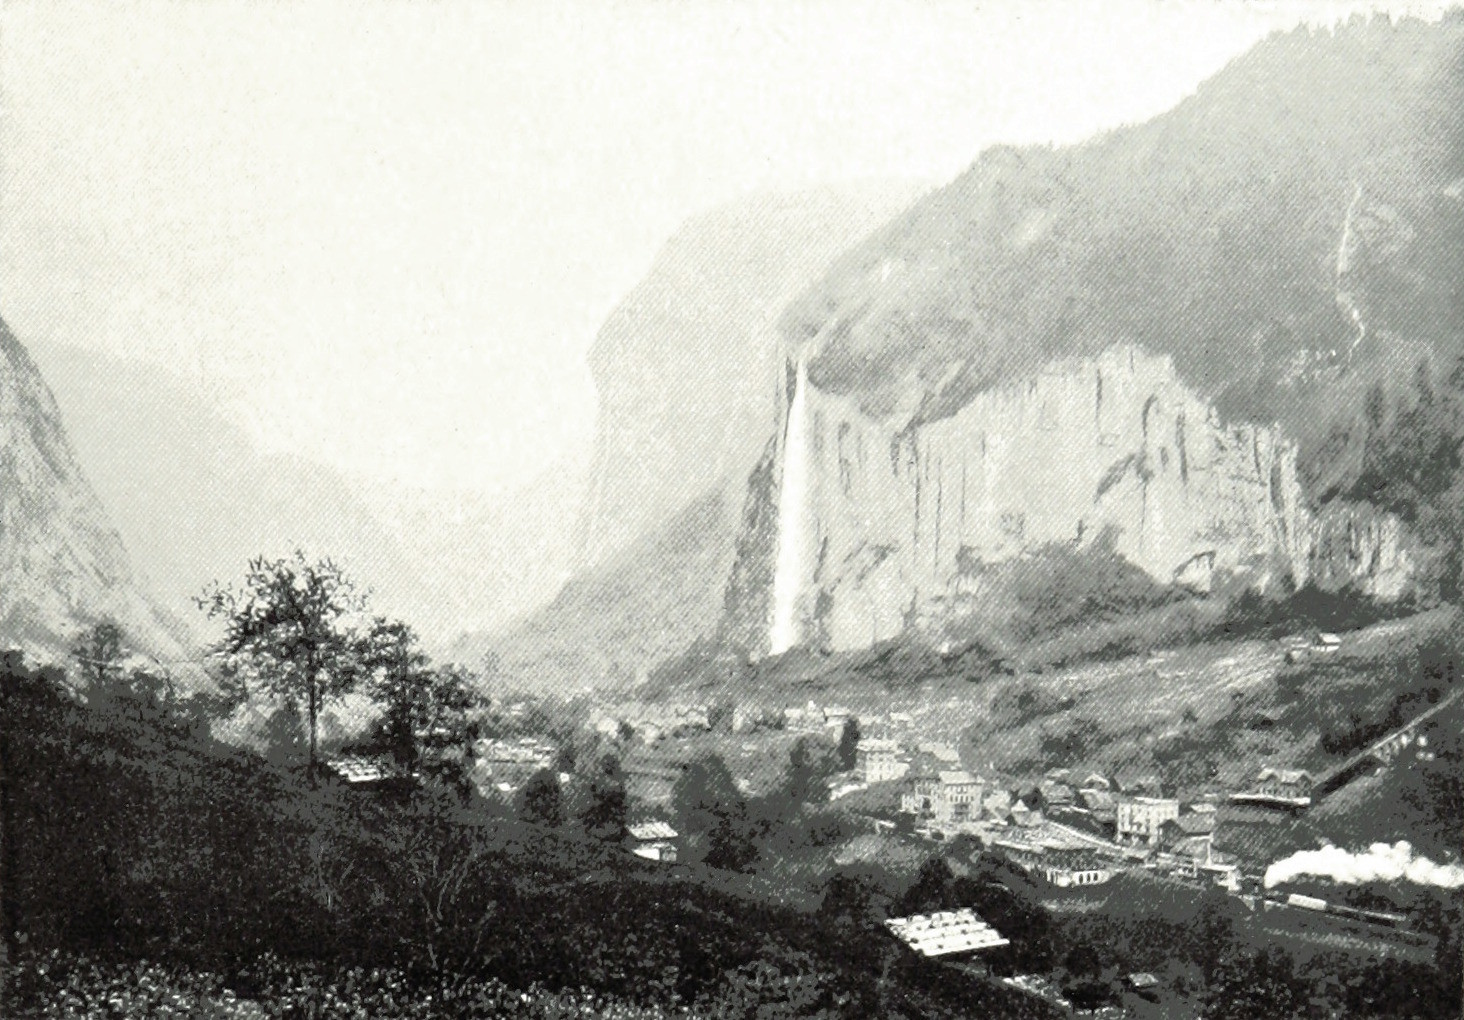 Lauterbrunnen par Theodor Wundt, en 1898